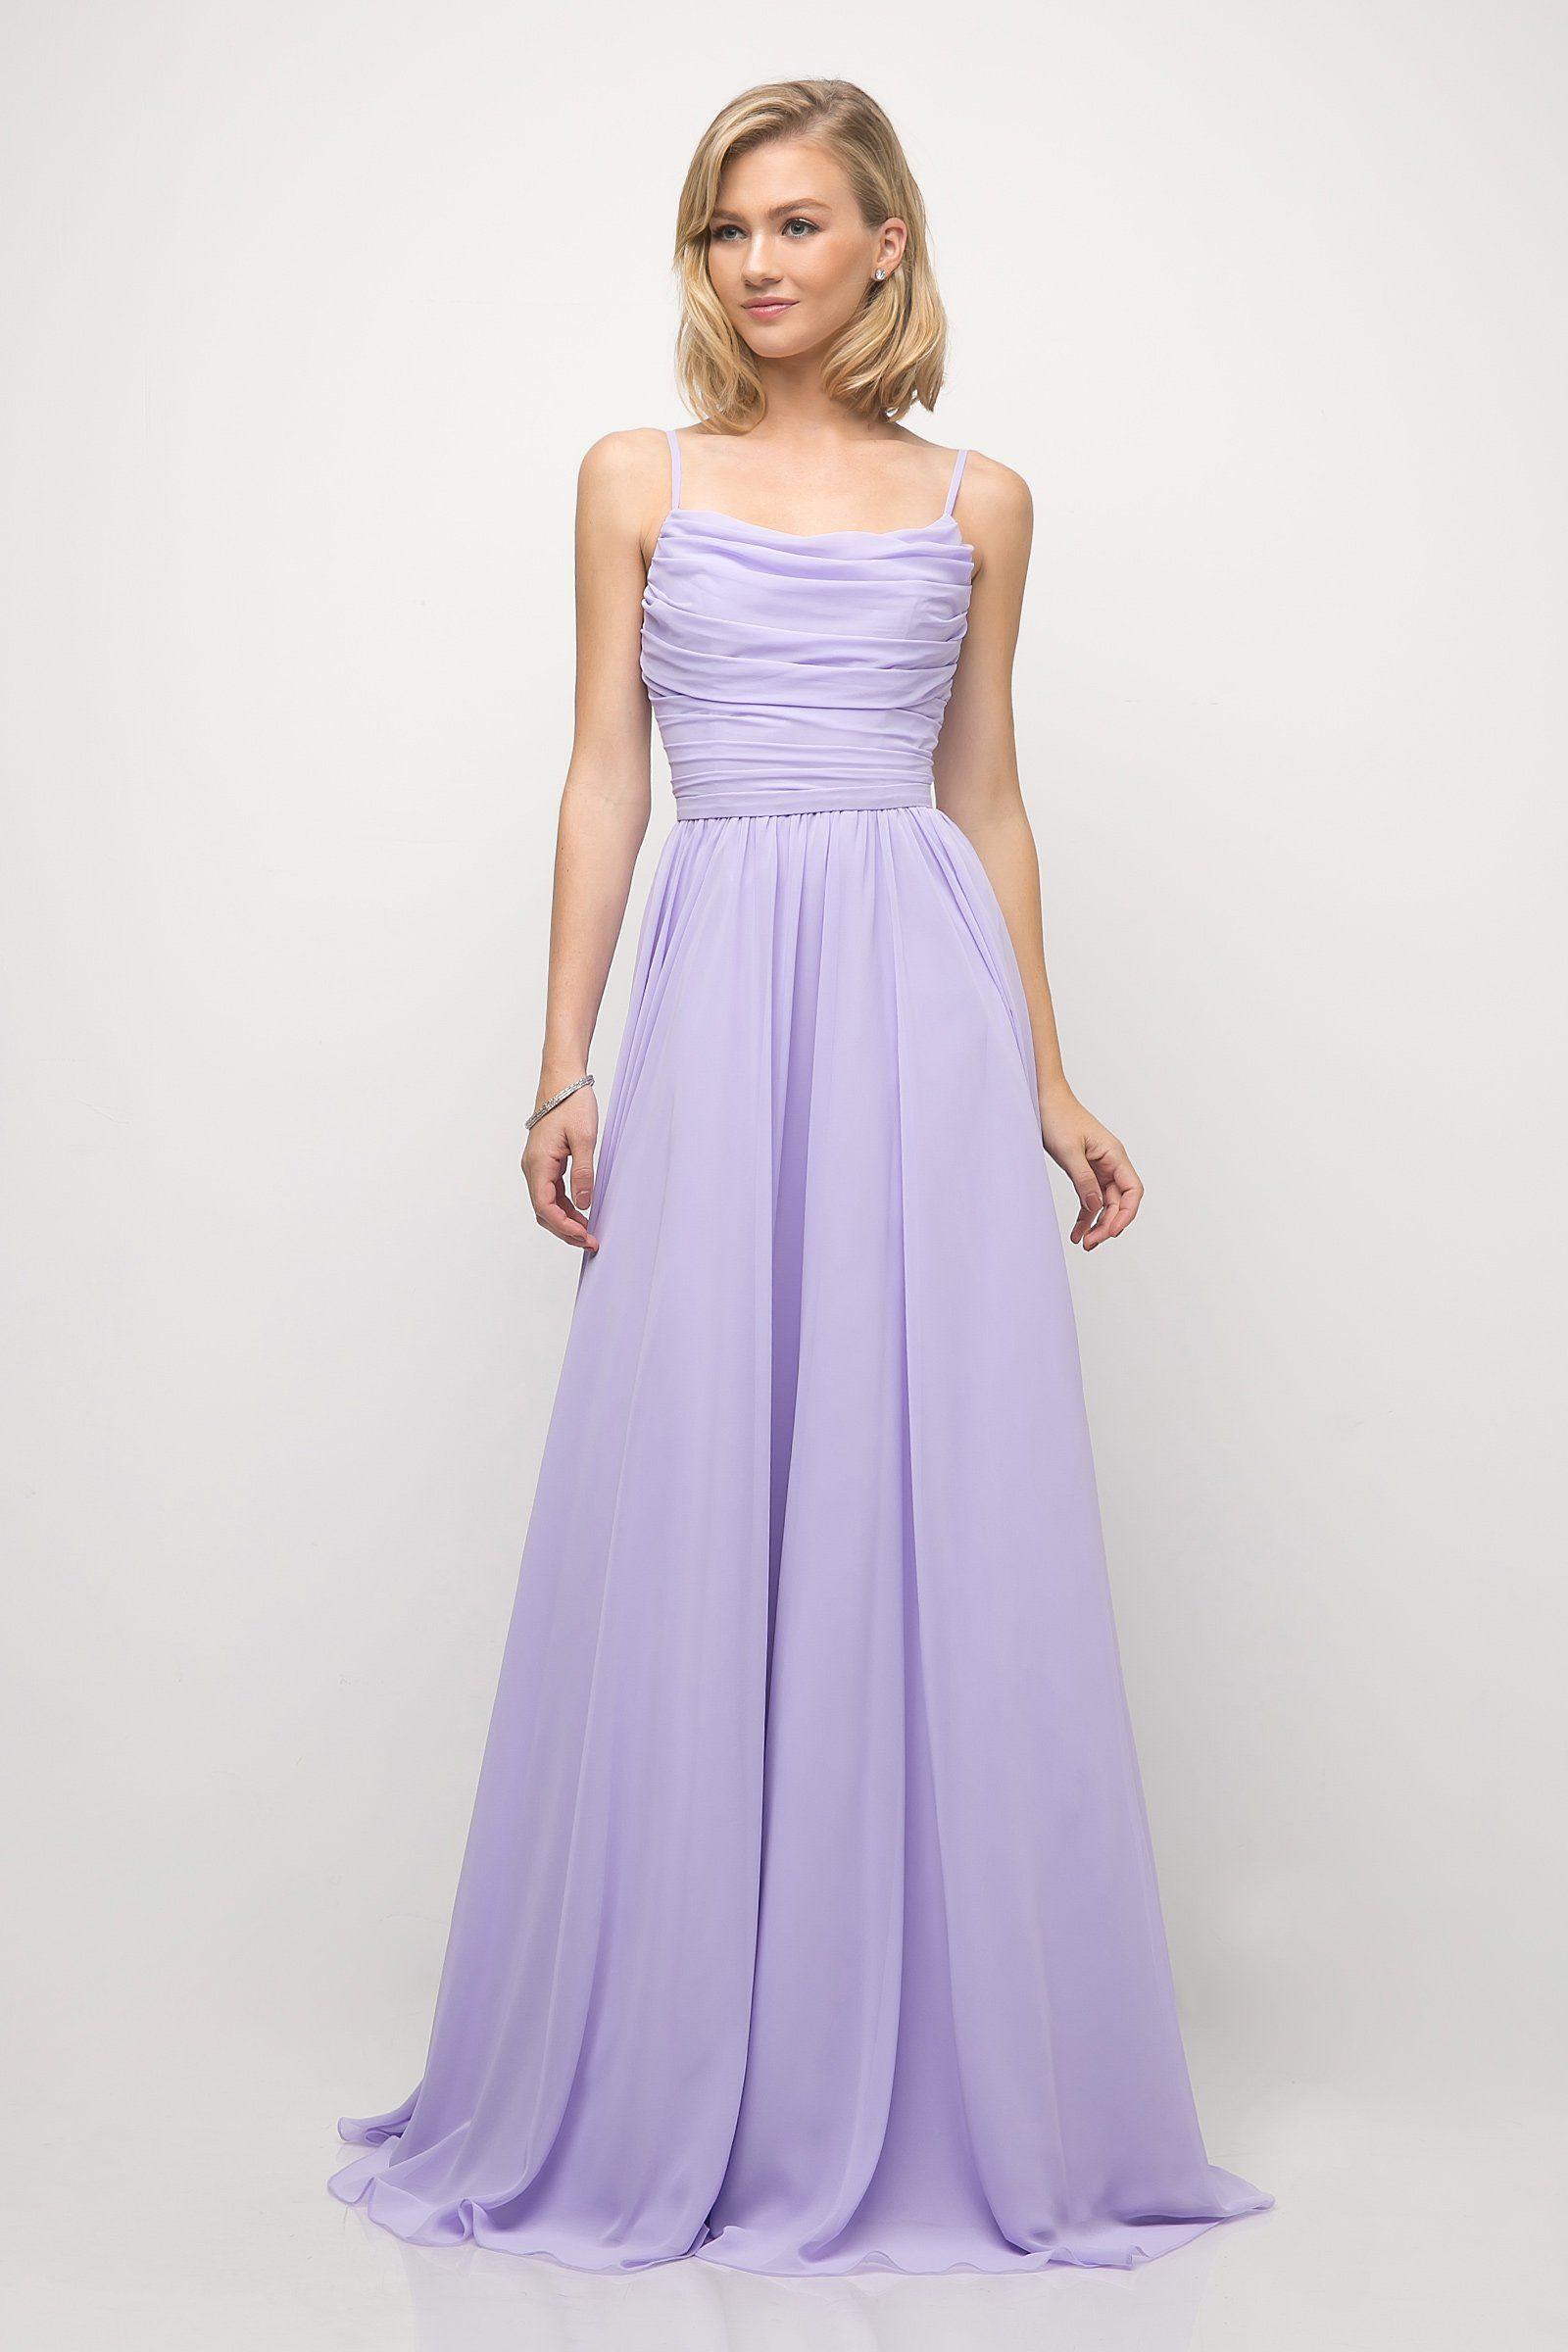 4febc2841a5 Ruched Long Empire Waist Dress by Cinderella Divine UR136 in 2019 ...